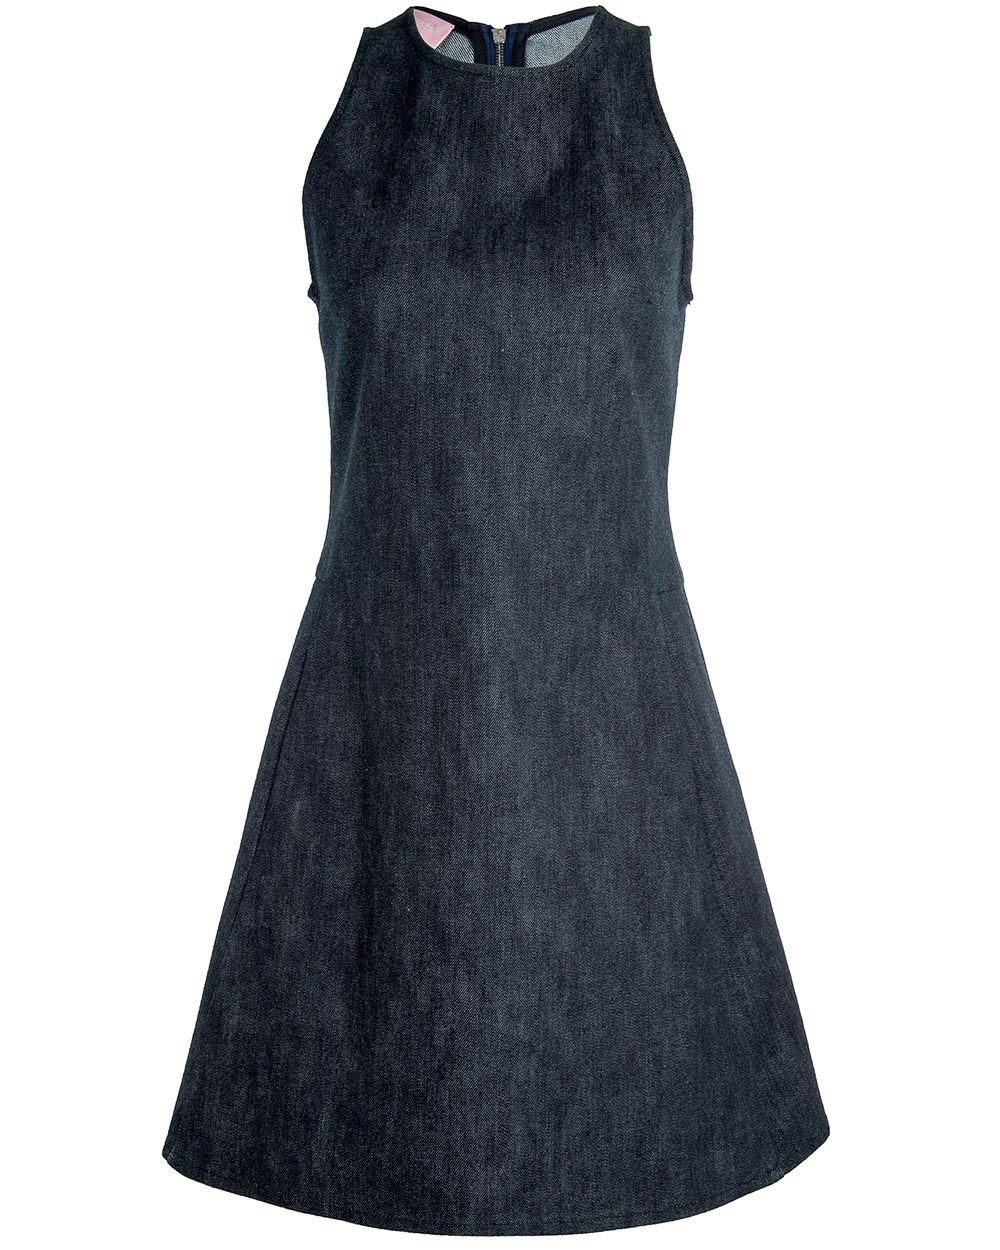 GiambaDenim A-Line Dress Fit and flare denim A-line dress